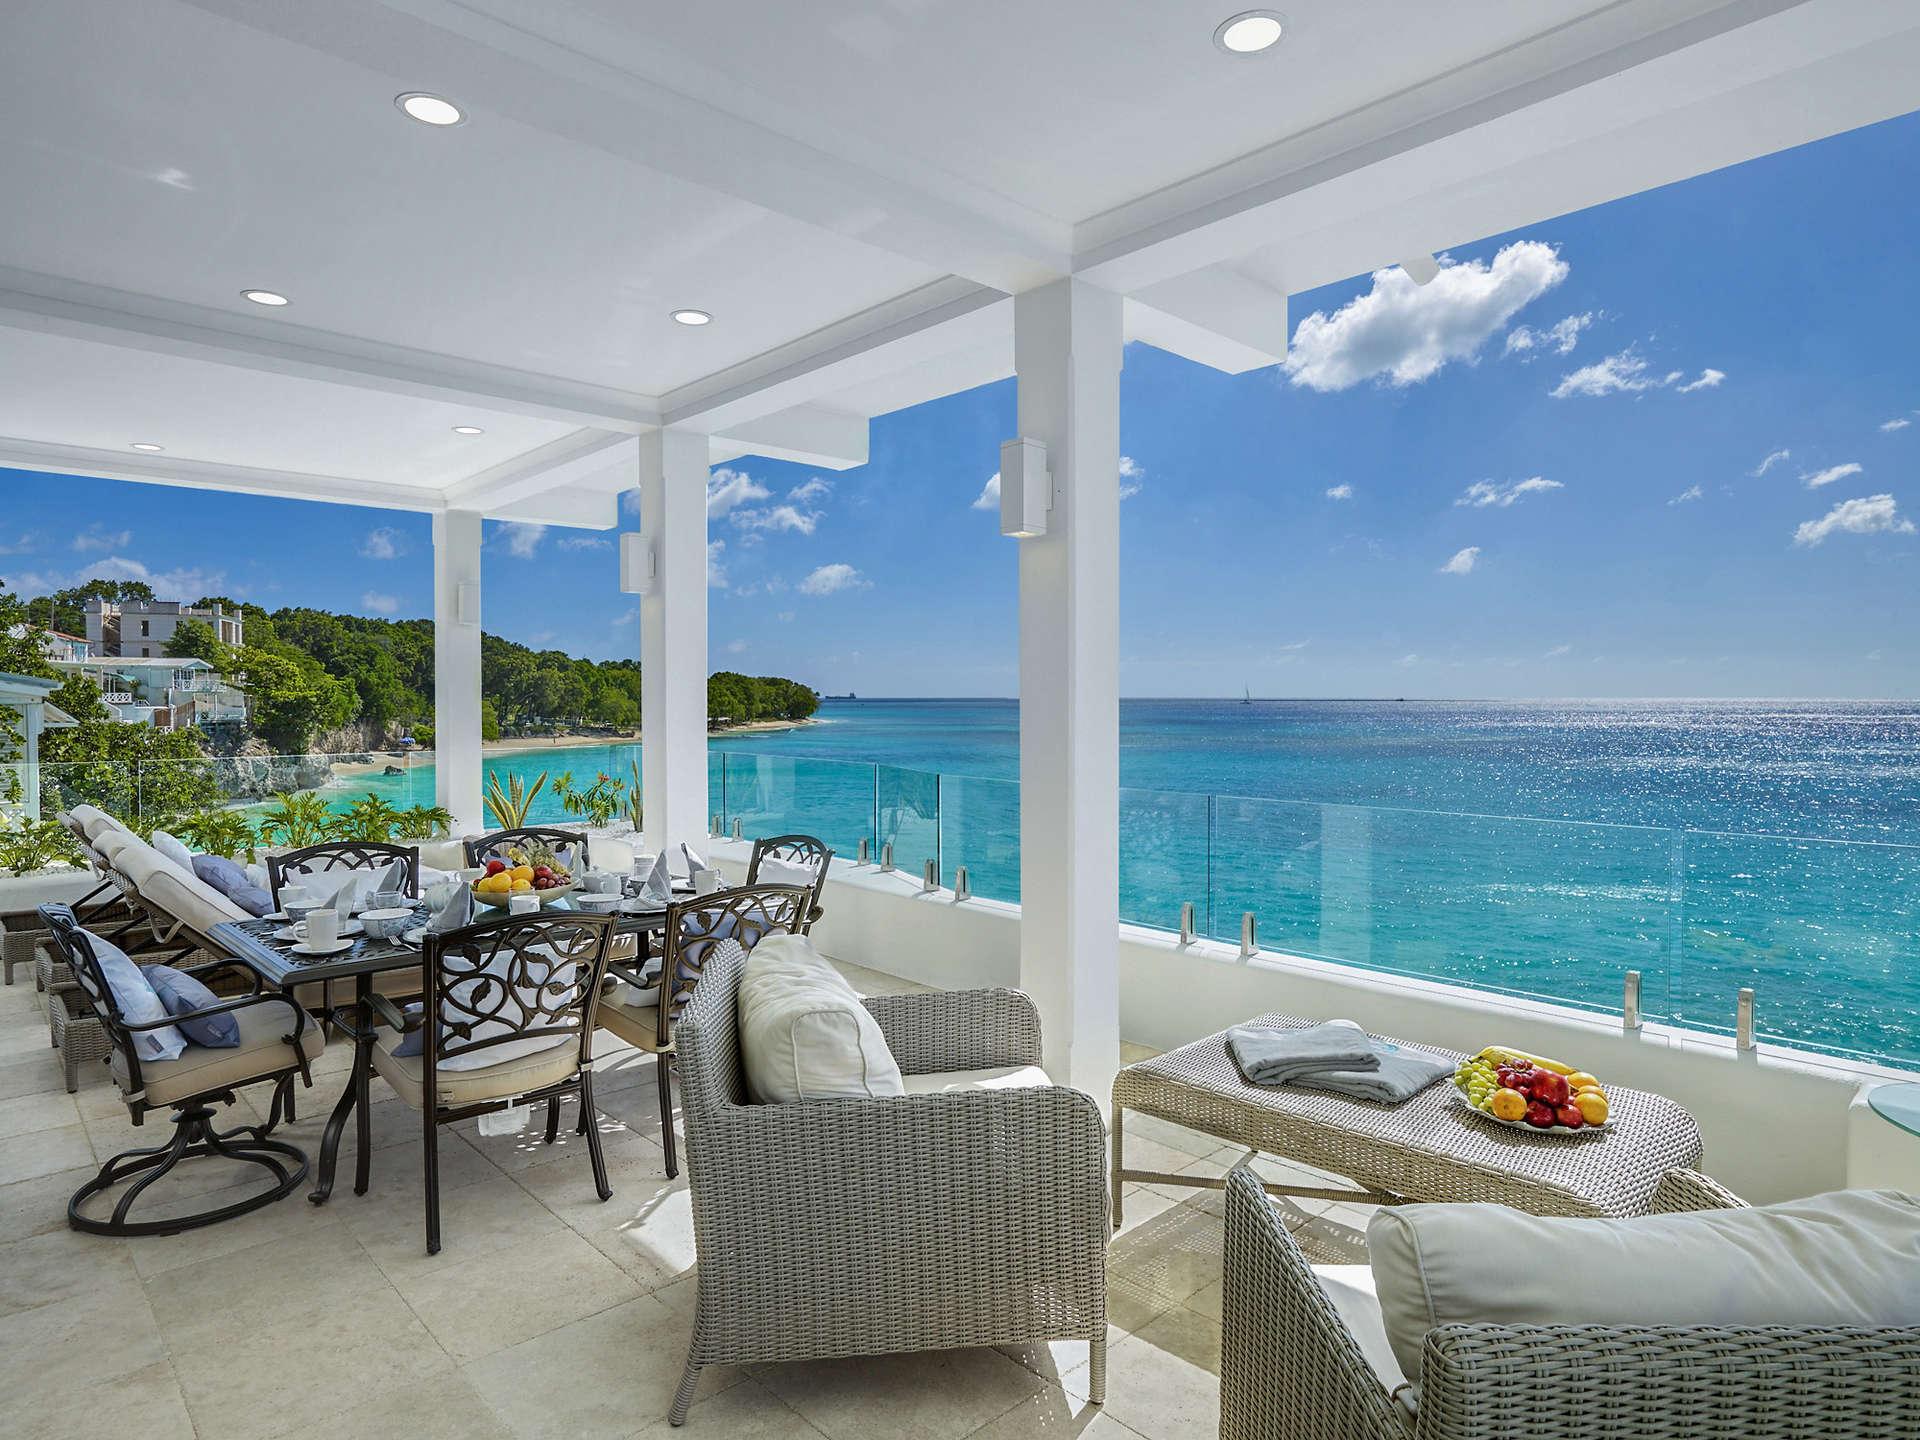 Luxury villa rentals caribbean - Barbados - St james - Prospect - Ocean Heights - Image 1/16